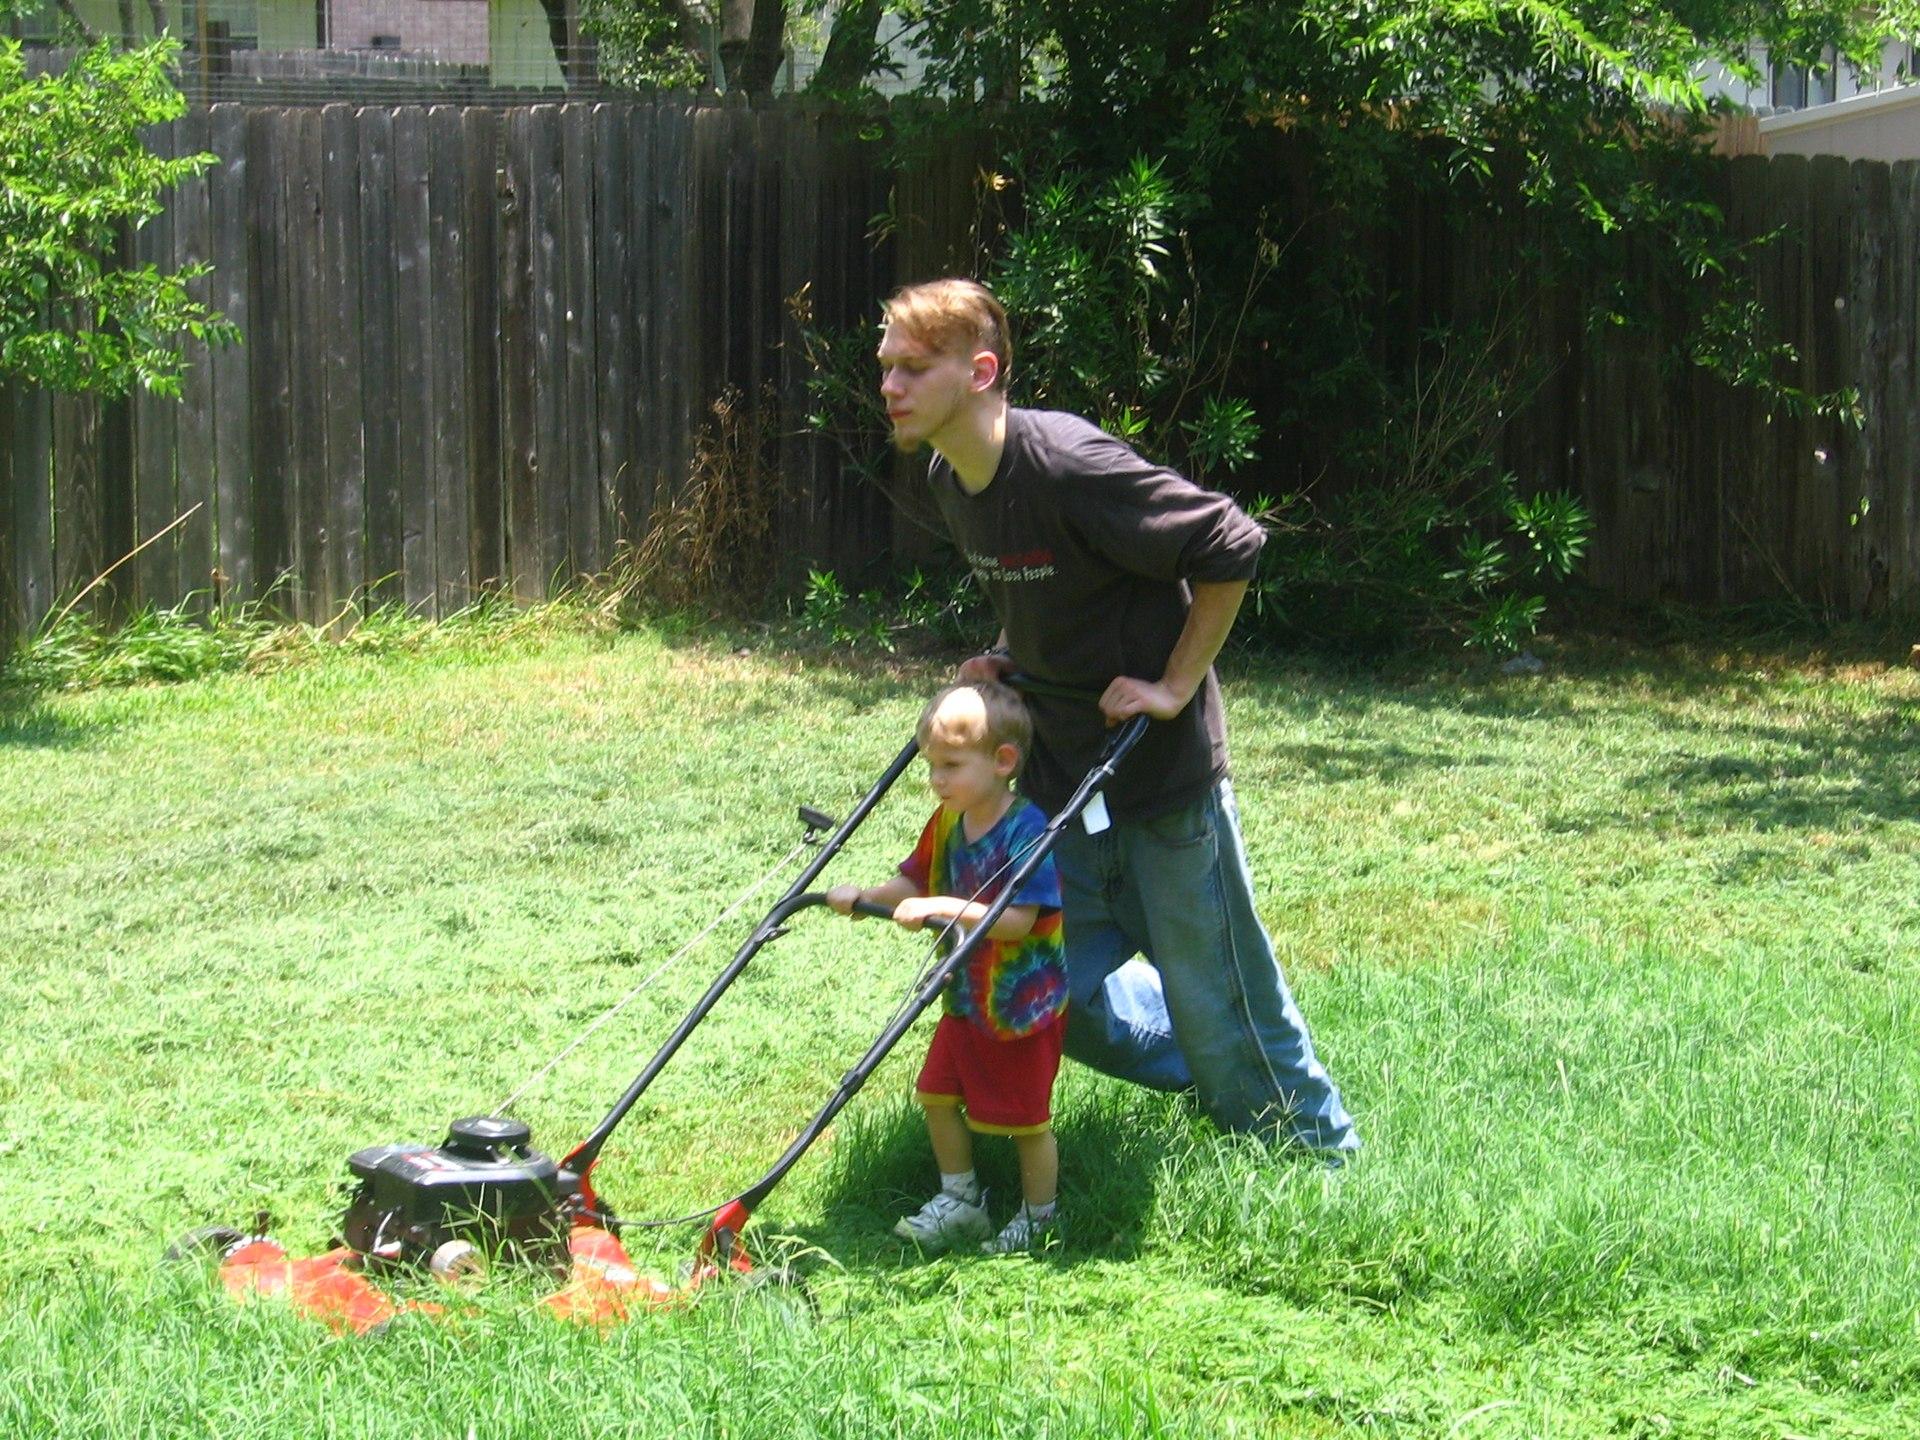 Lawn mower - Wikimedia Commons